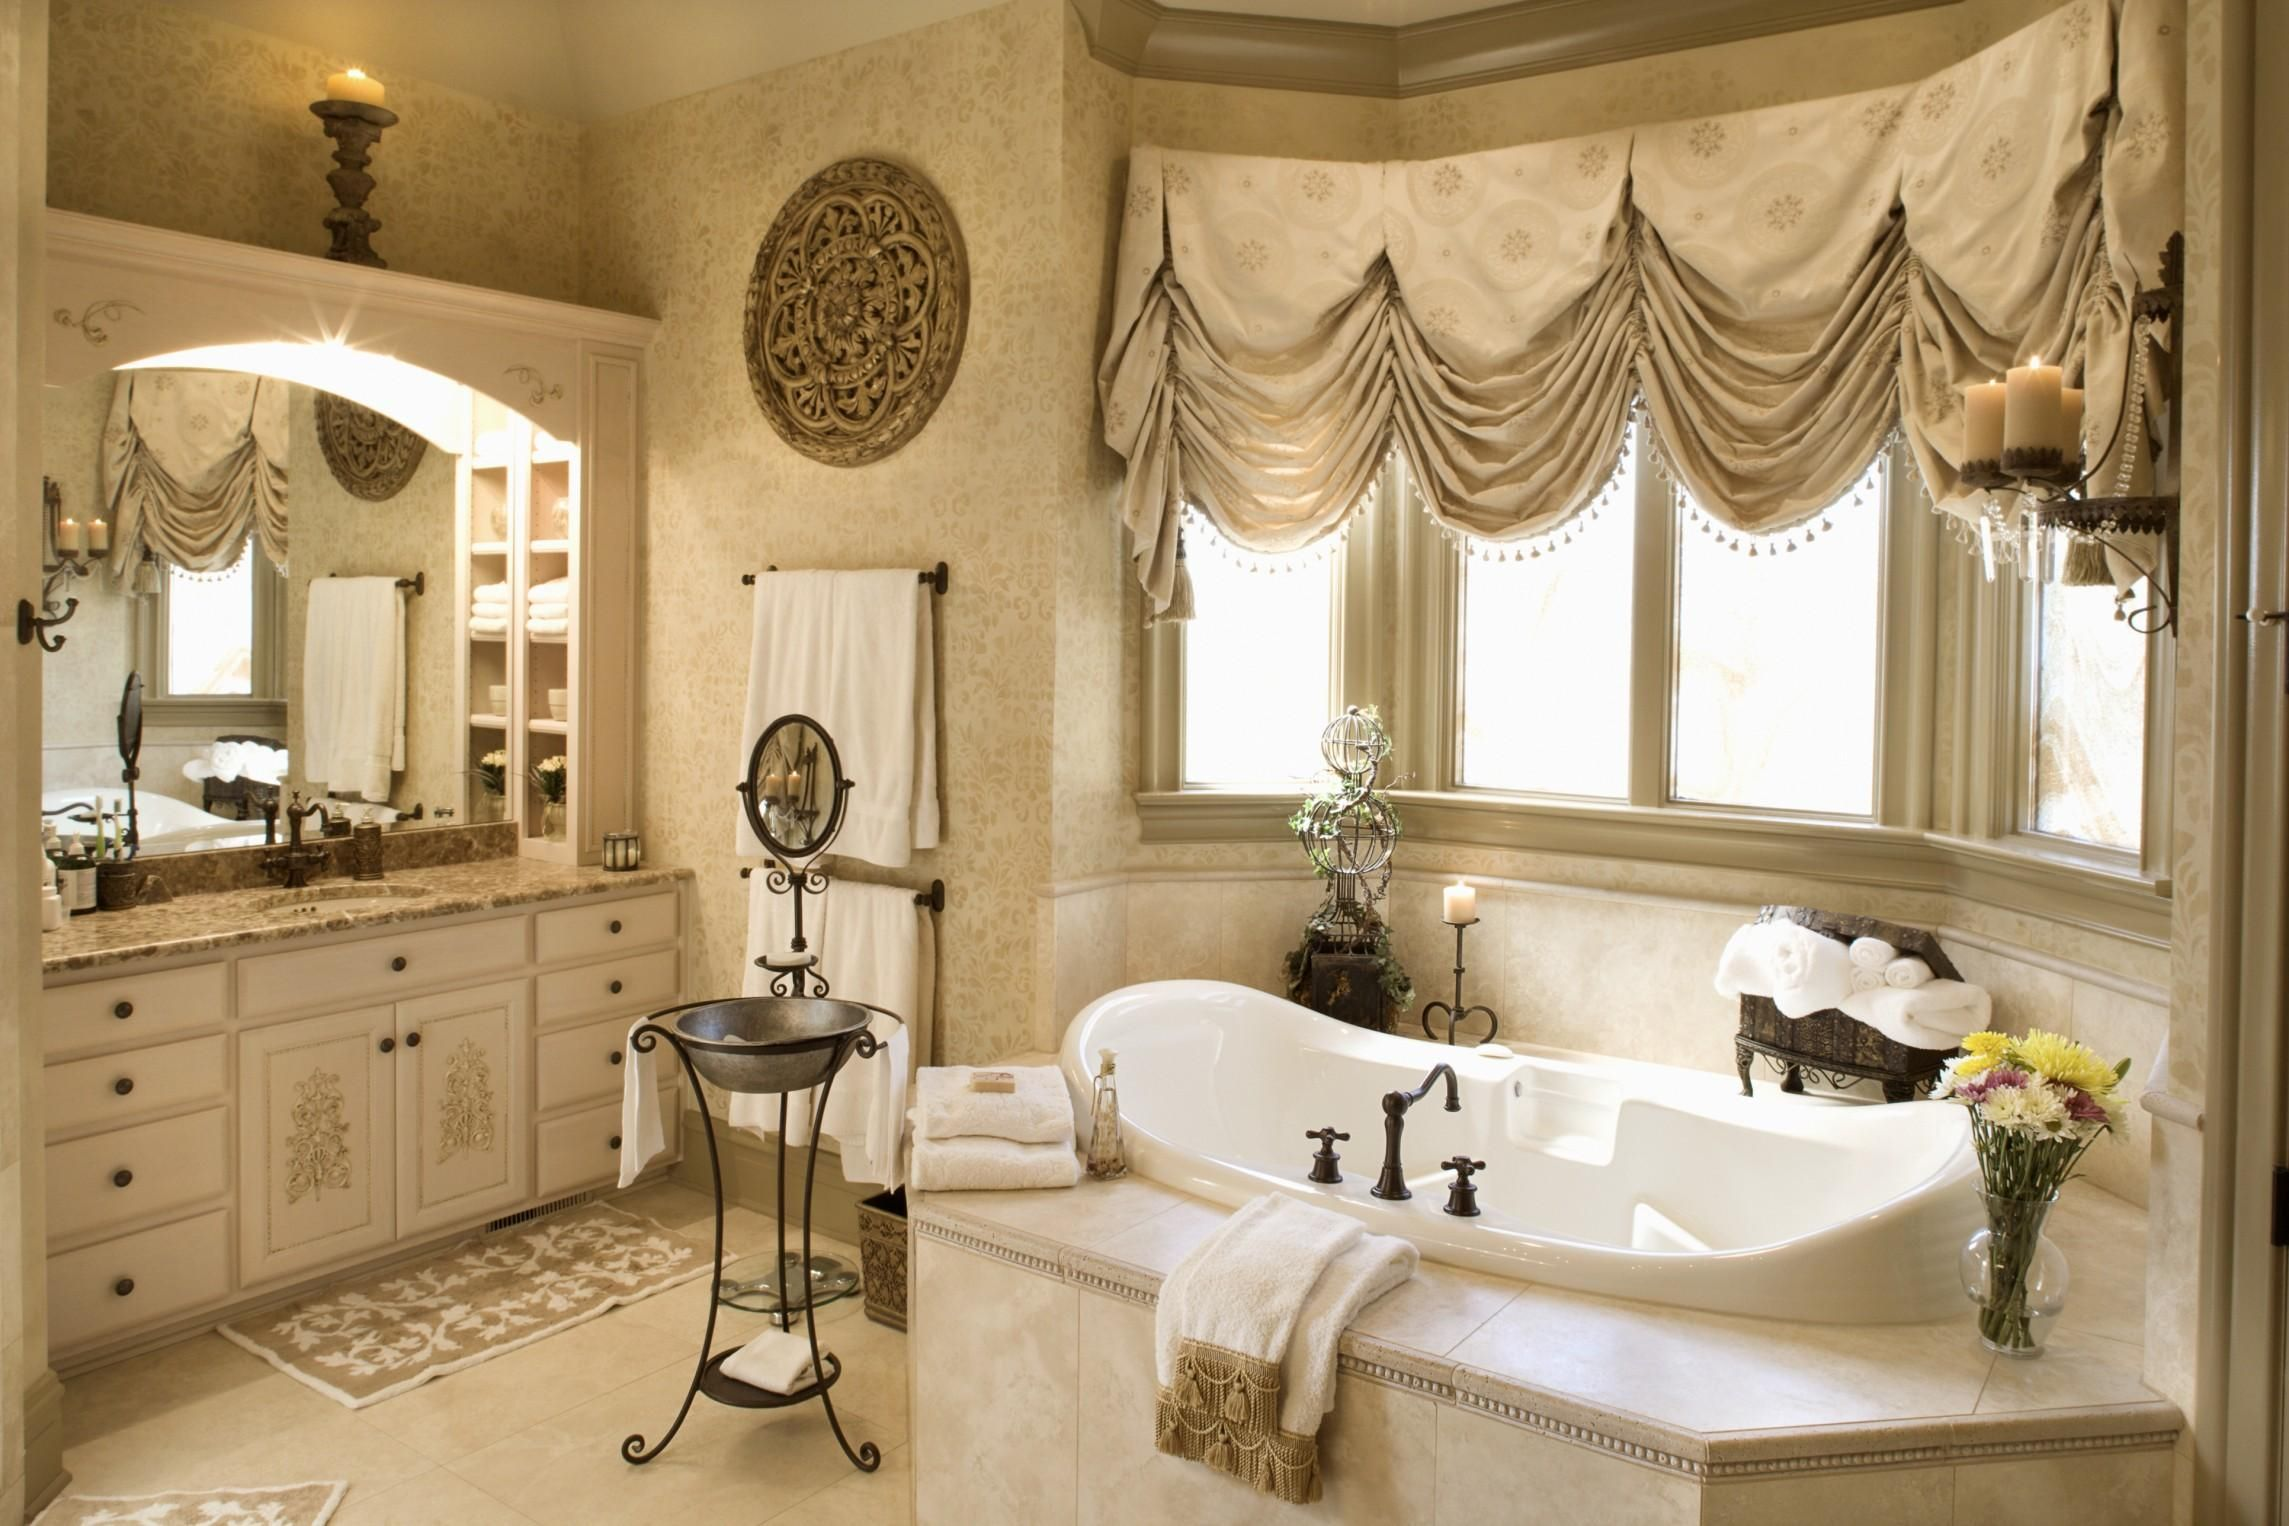 Bagno bellissimo | arredamento bagno | Pinterest | Arredamento ...